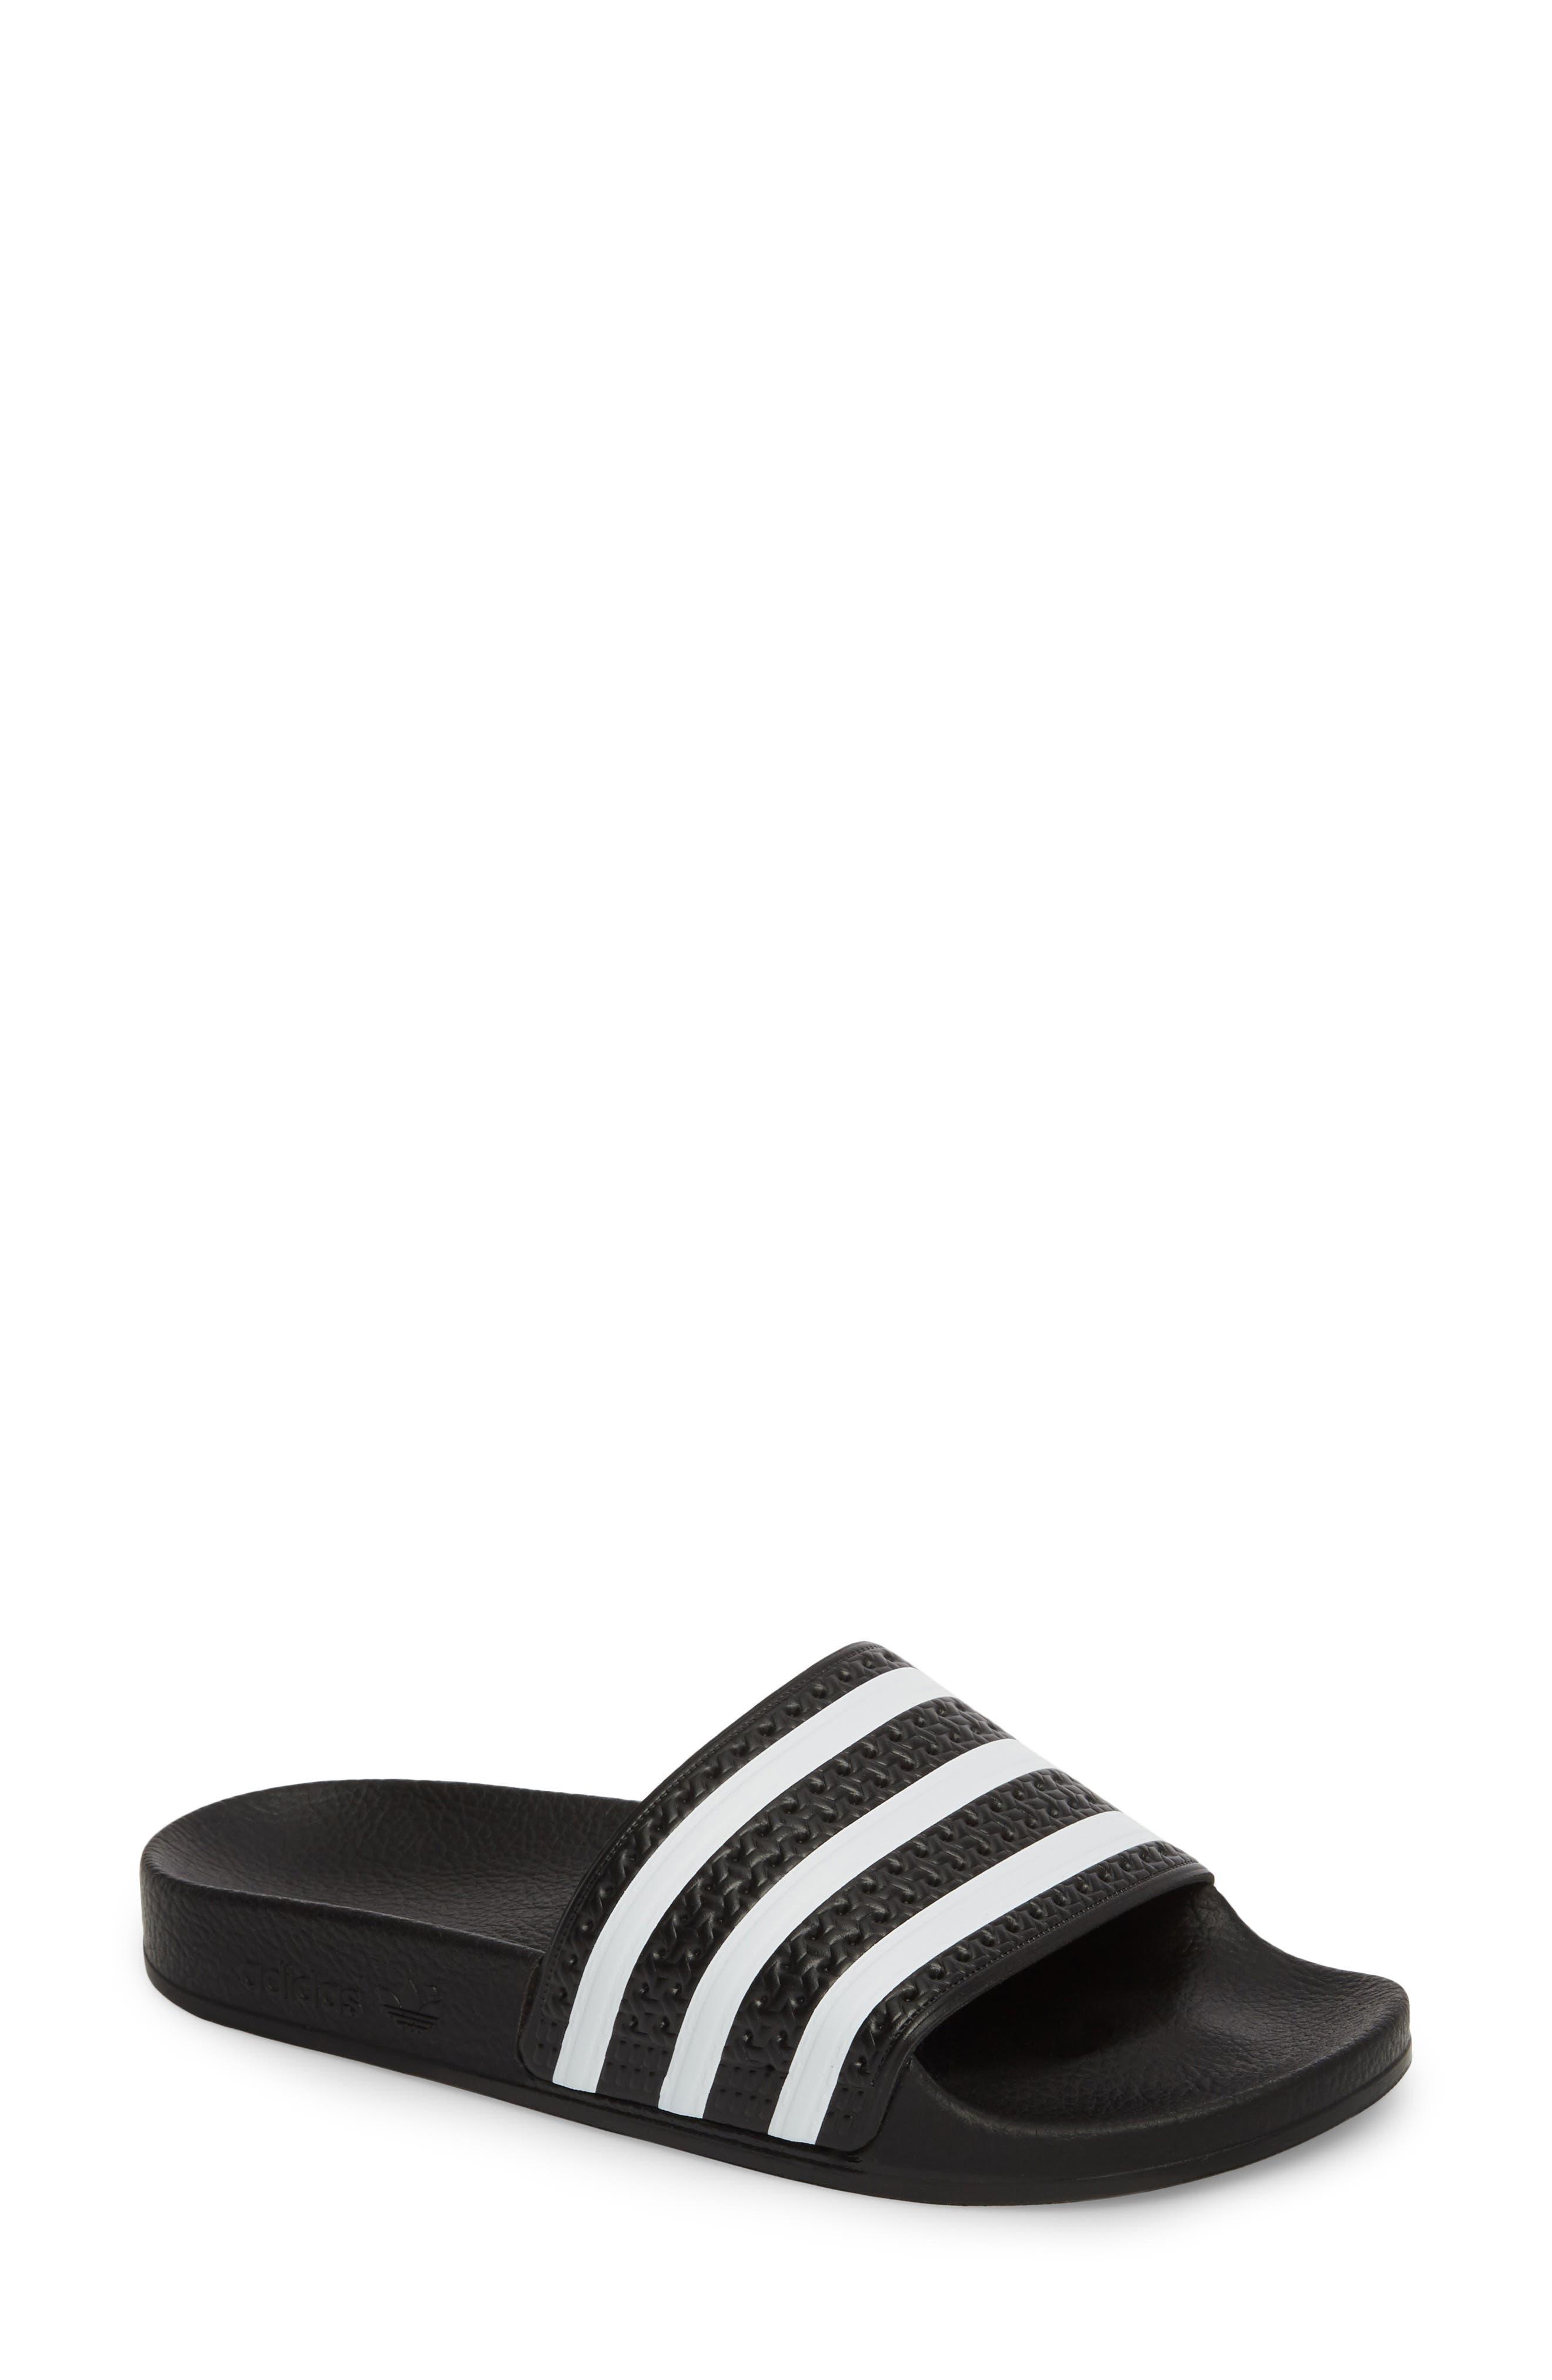 'Adilette' Slide Sandal,                         Main,                         color, CORE BLACK/ WHITE/ CORE BLACK